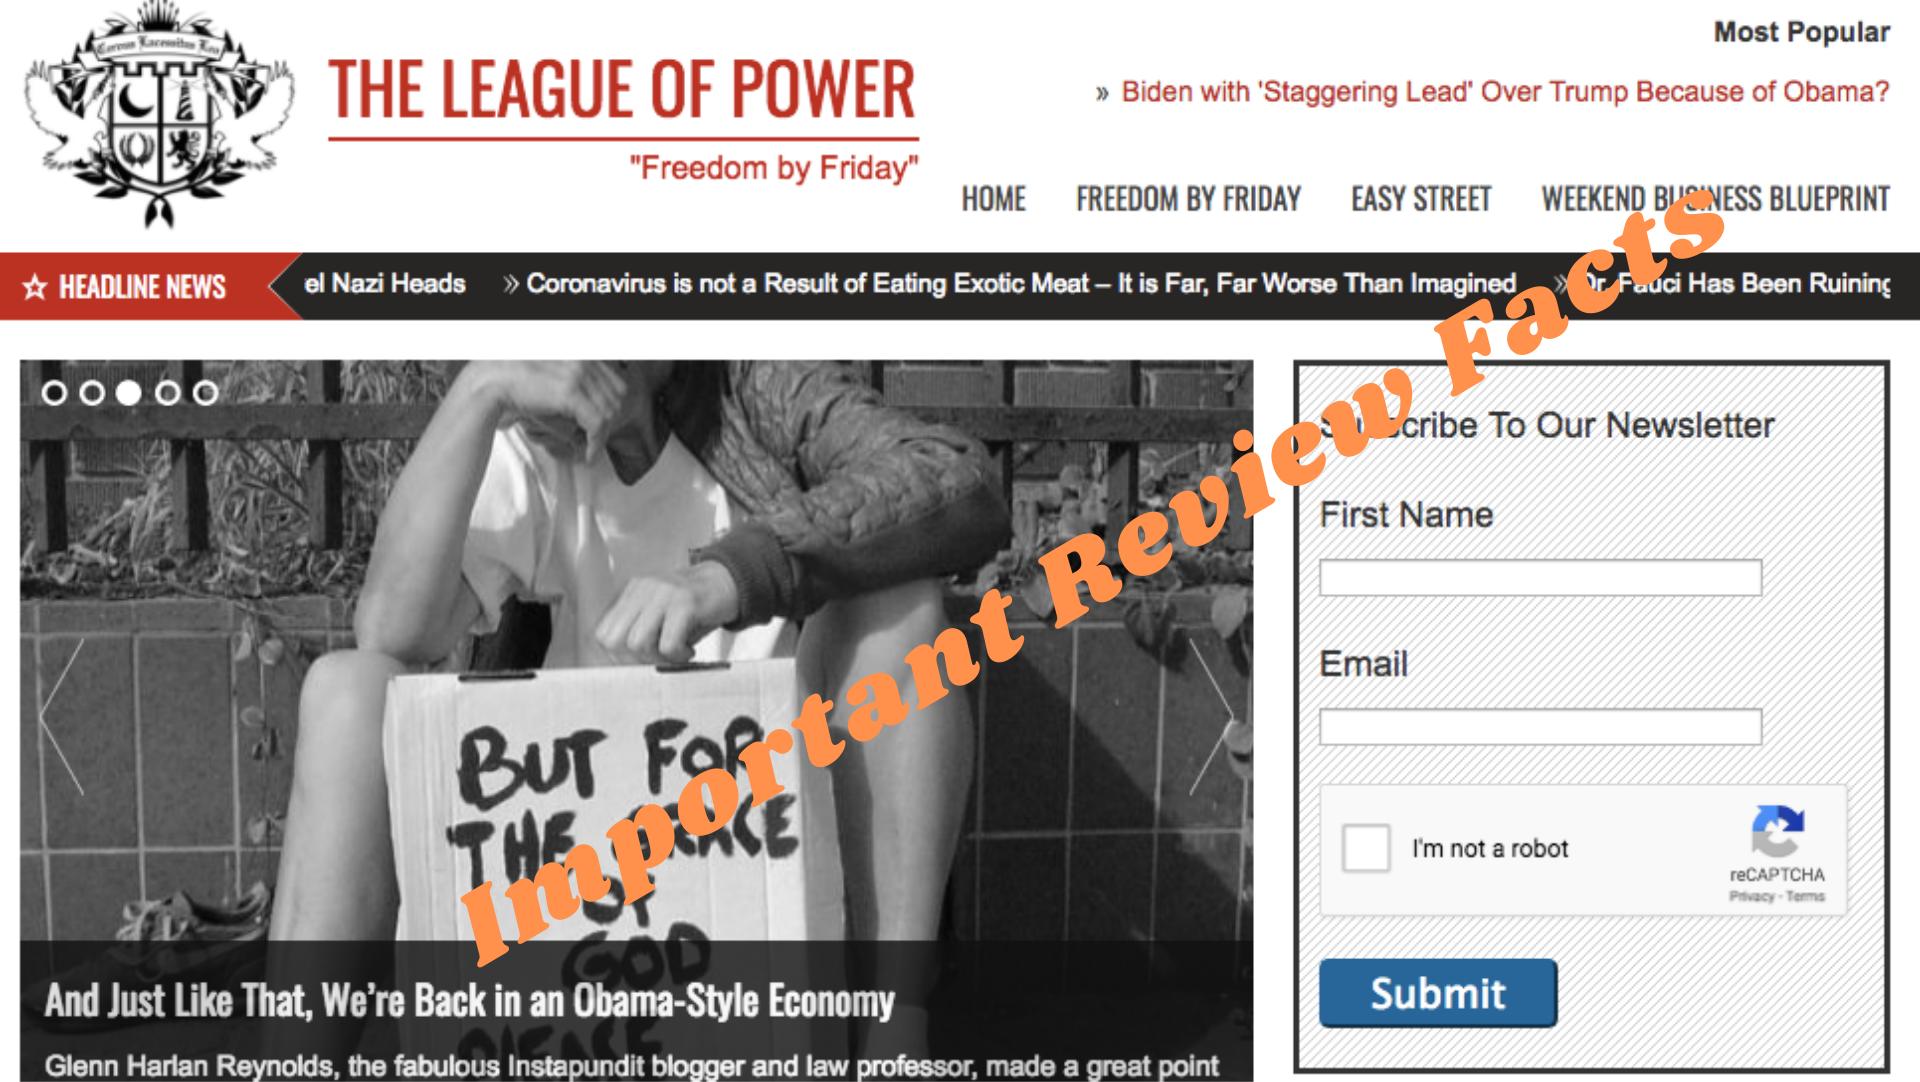 League of power newsletter